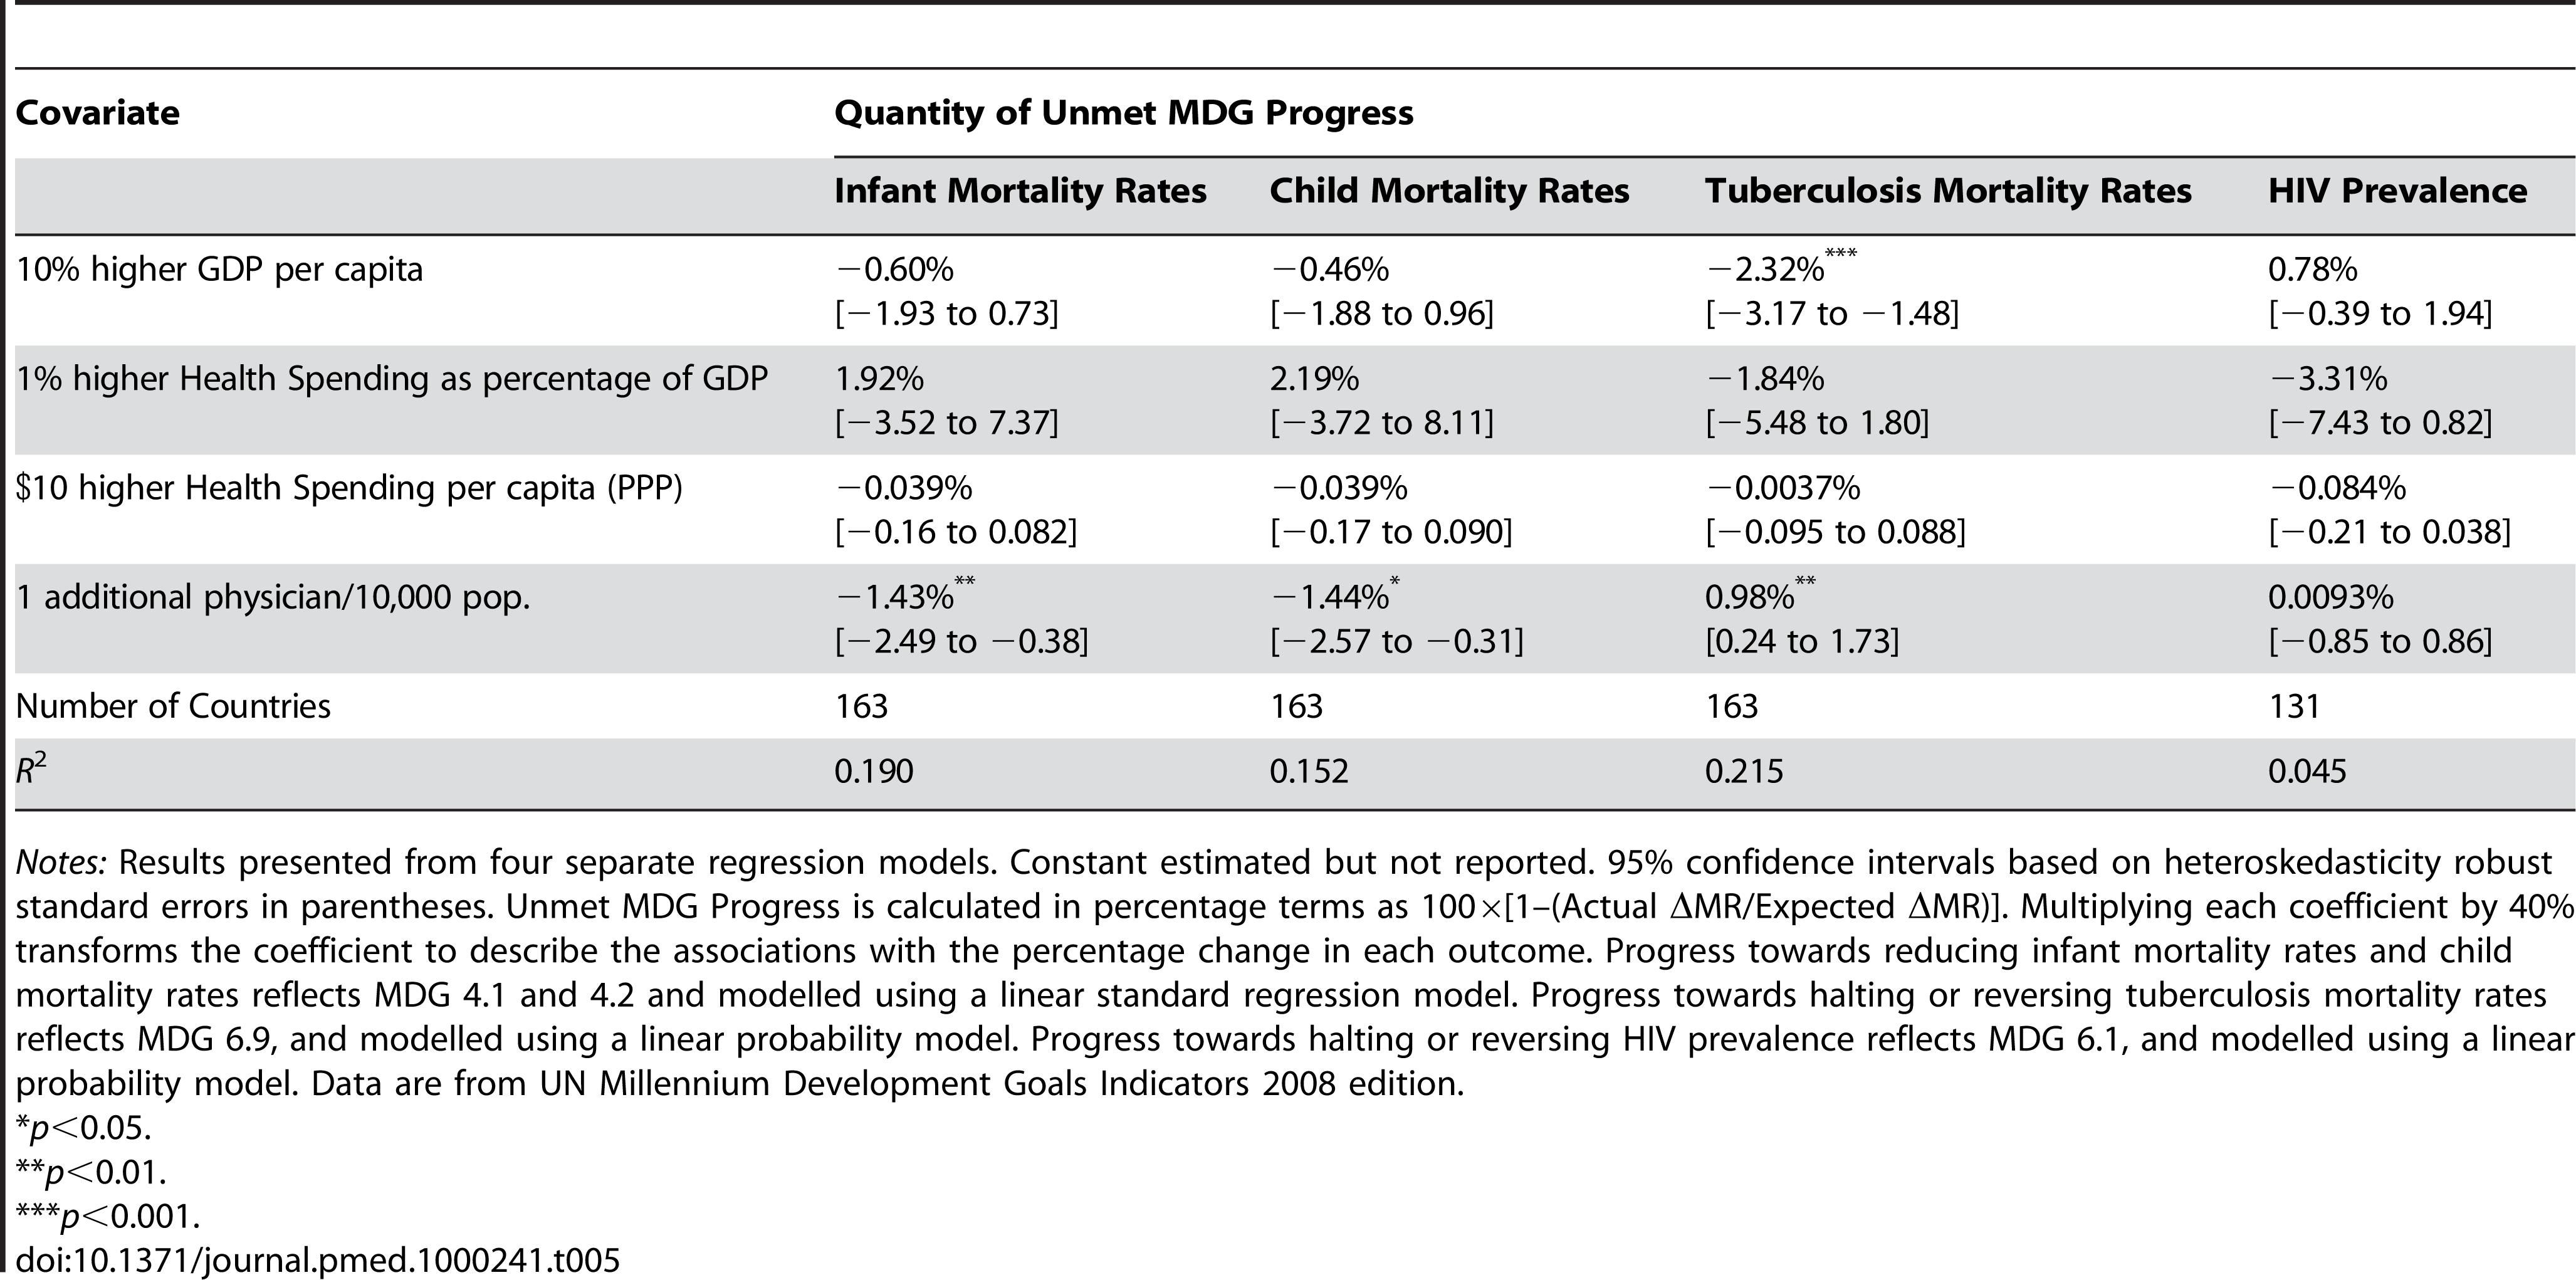 Associations of GDP per capita, health spending/GDP, health spending, and physicians per capita with percentage of unmet progress toward health MDGs.